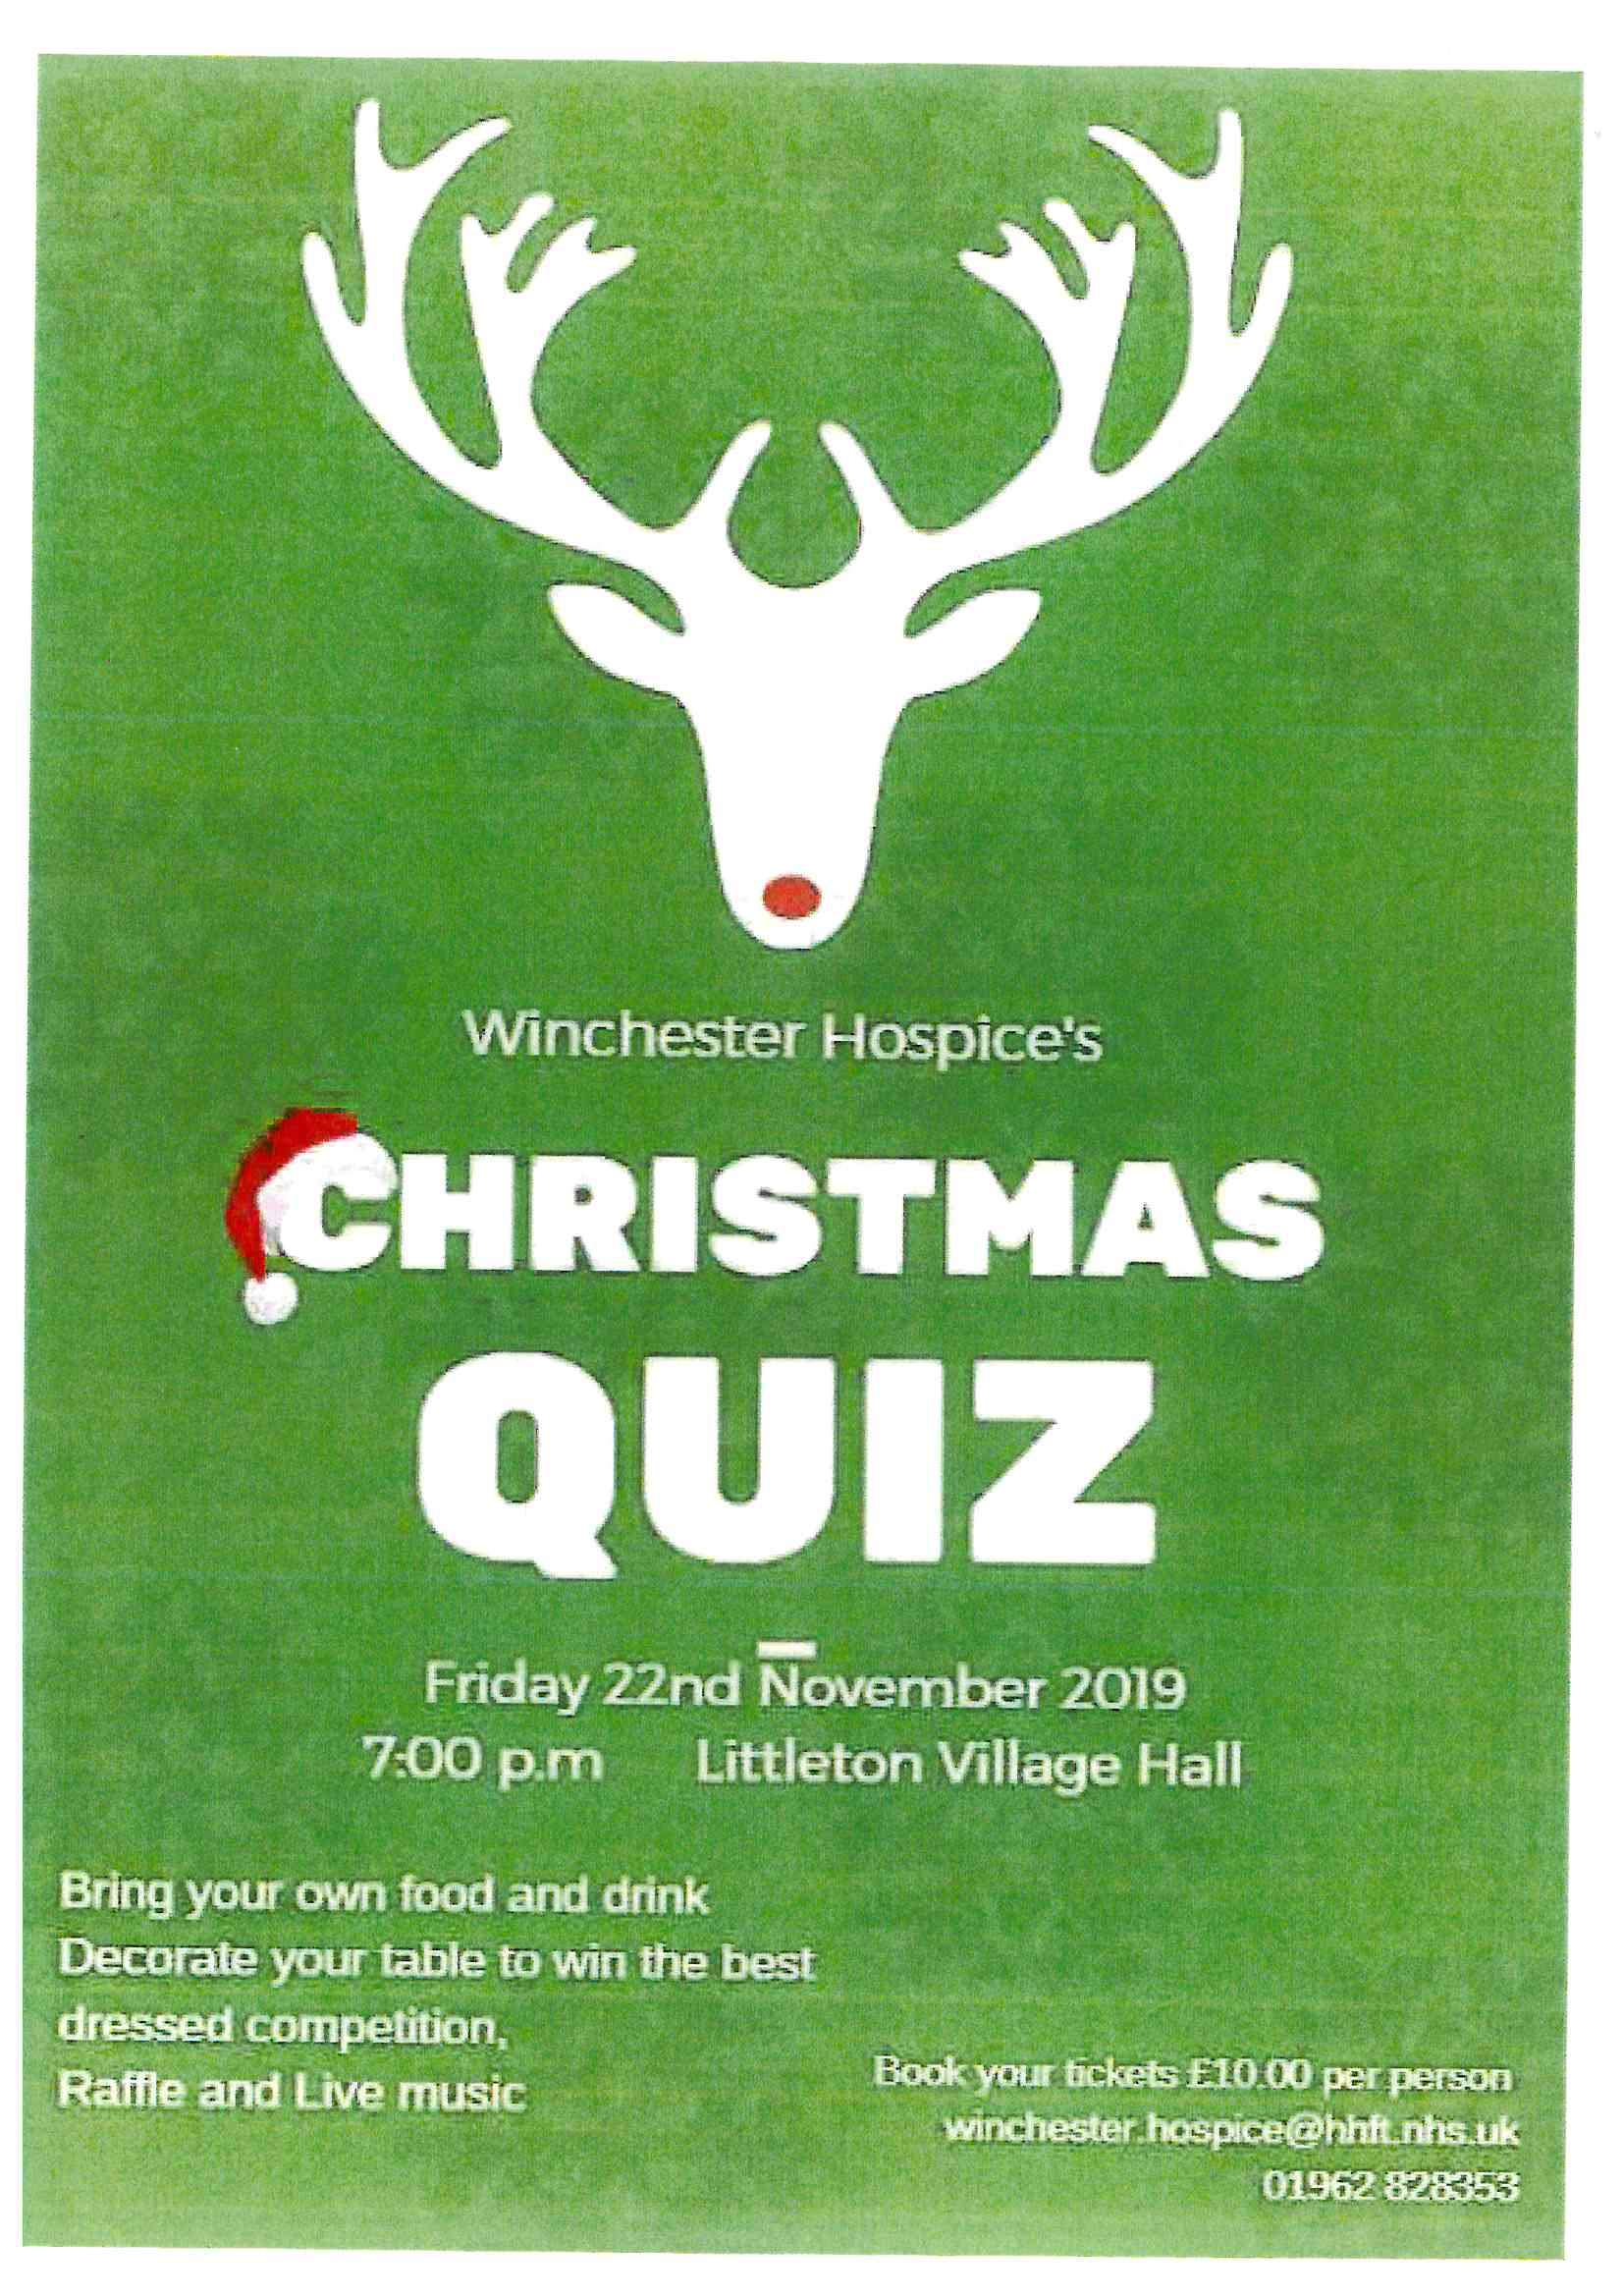 Christmas Quiz on behalf of Winchester Hospice at Littleton Village Hall.